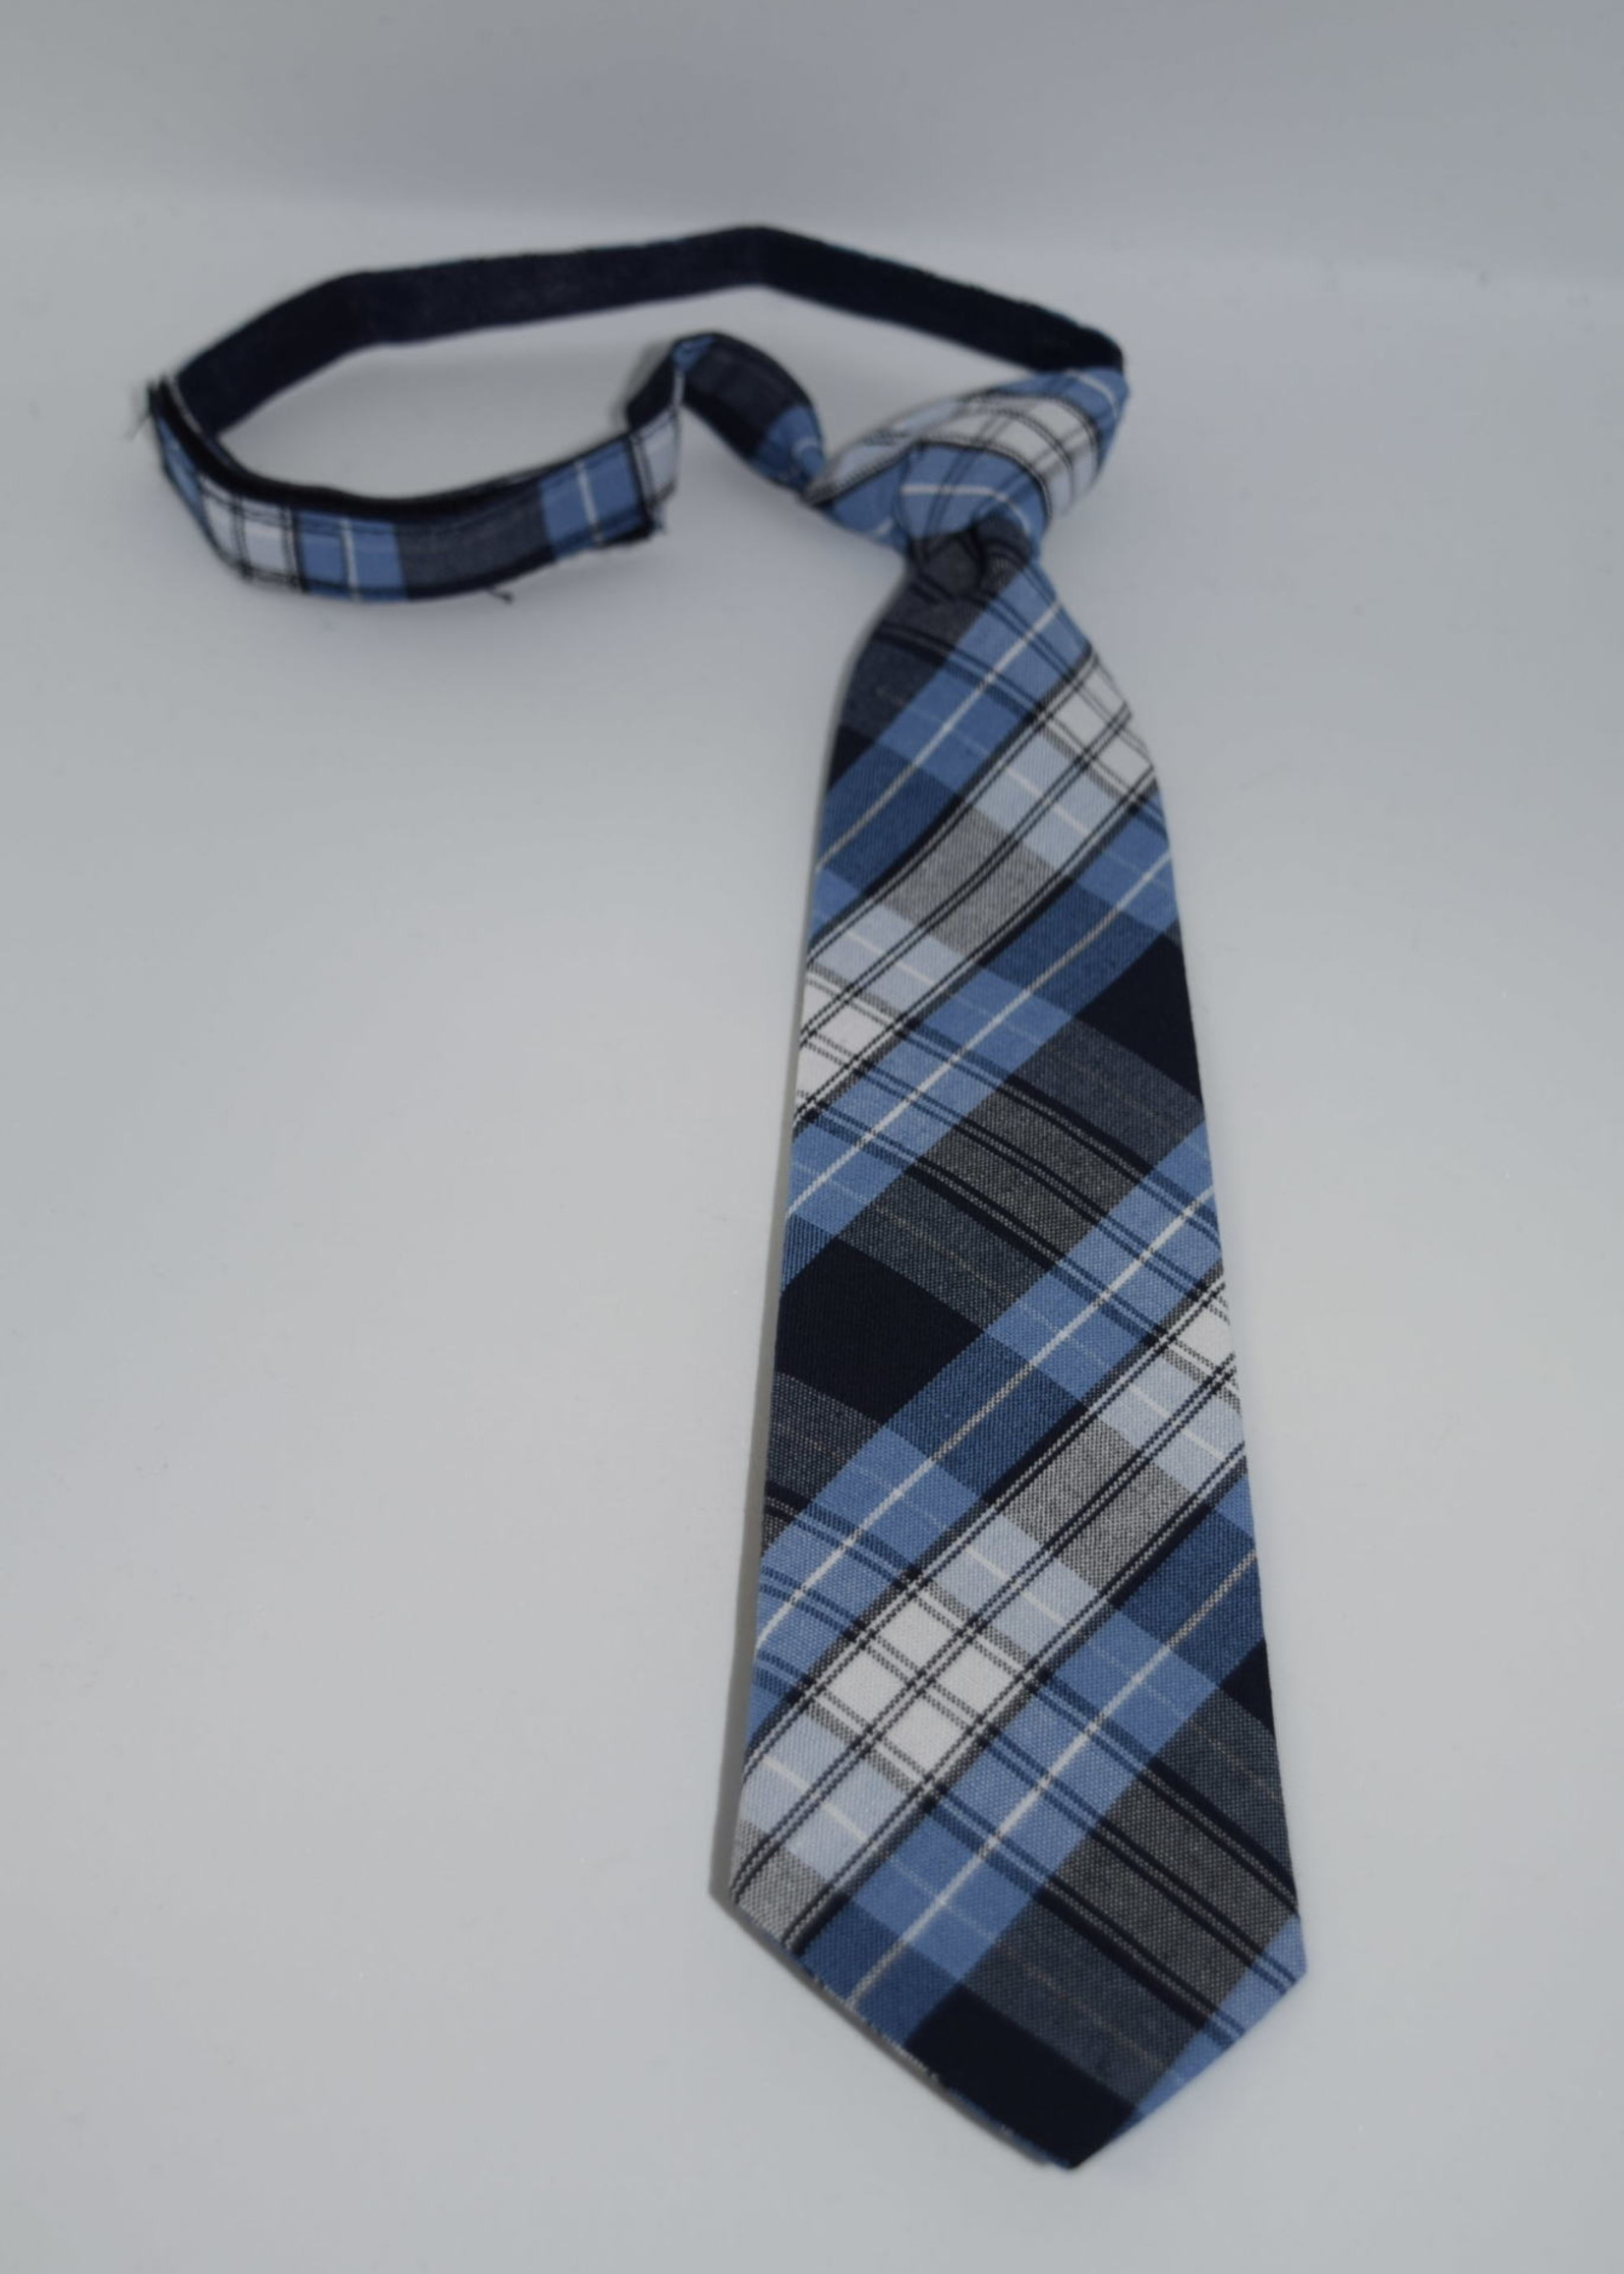 EDT Plaid Neck Tie - Pre tied tie w/velcro closure  P76